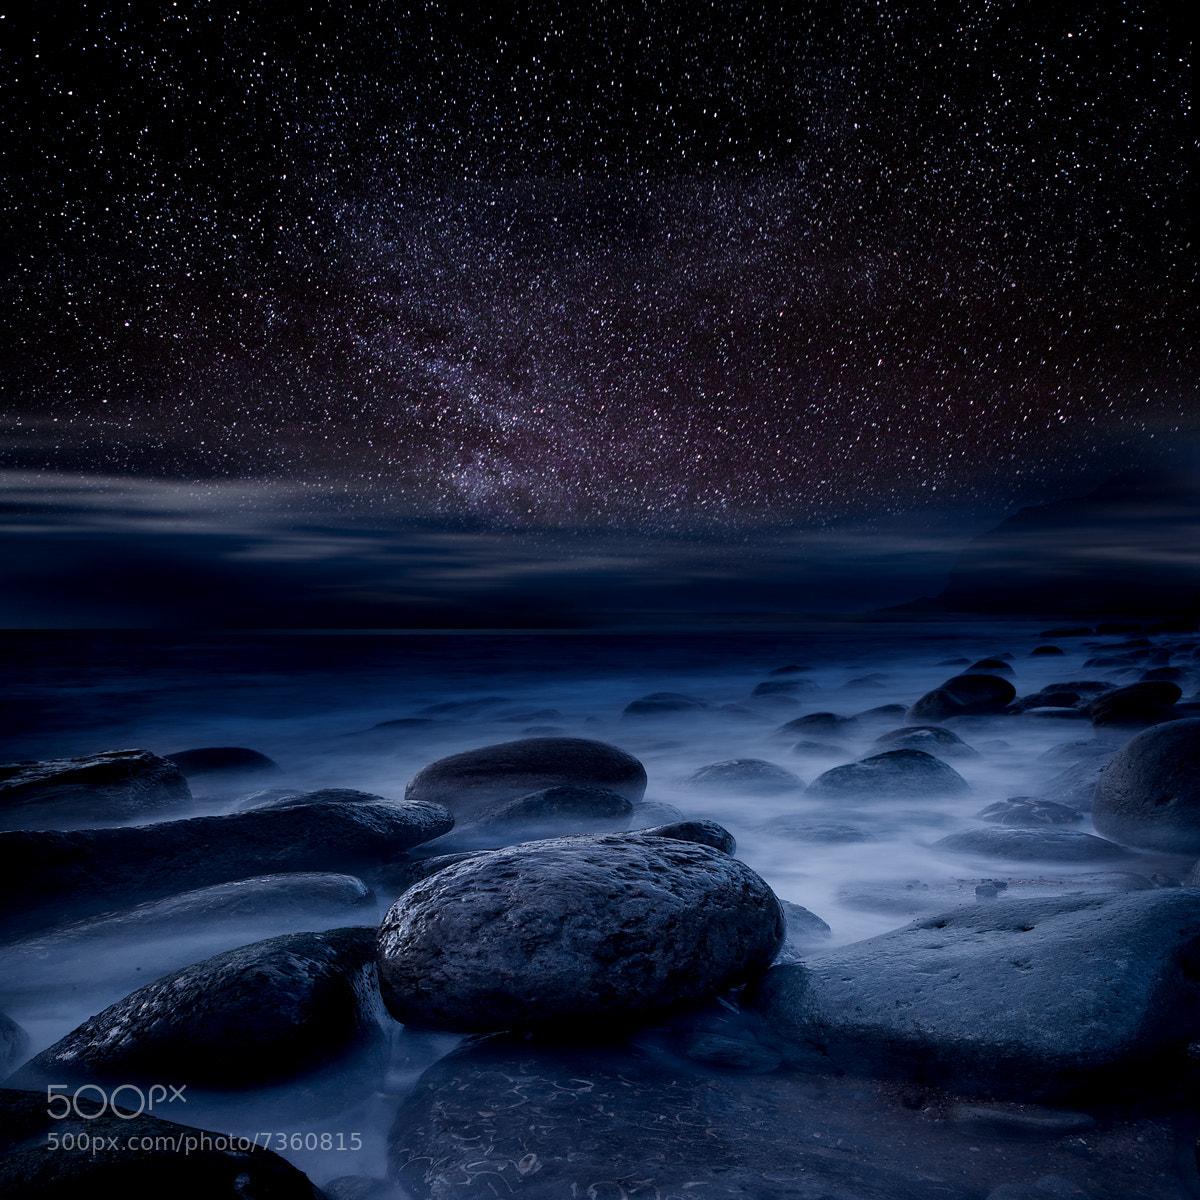 Photograph Eternal breath by Jorge Maia on 500px